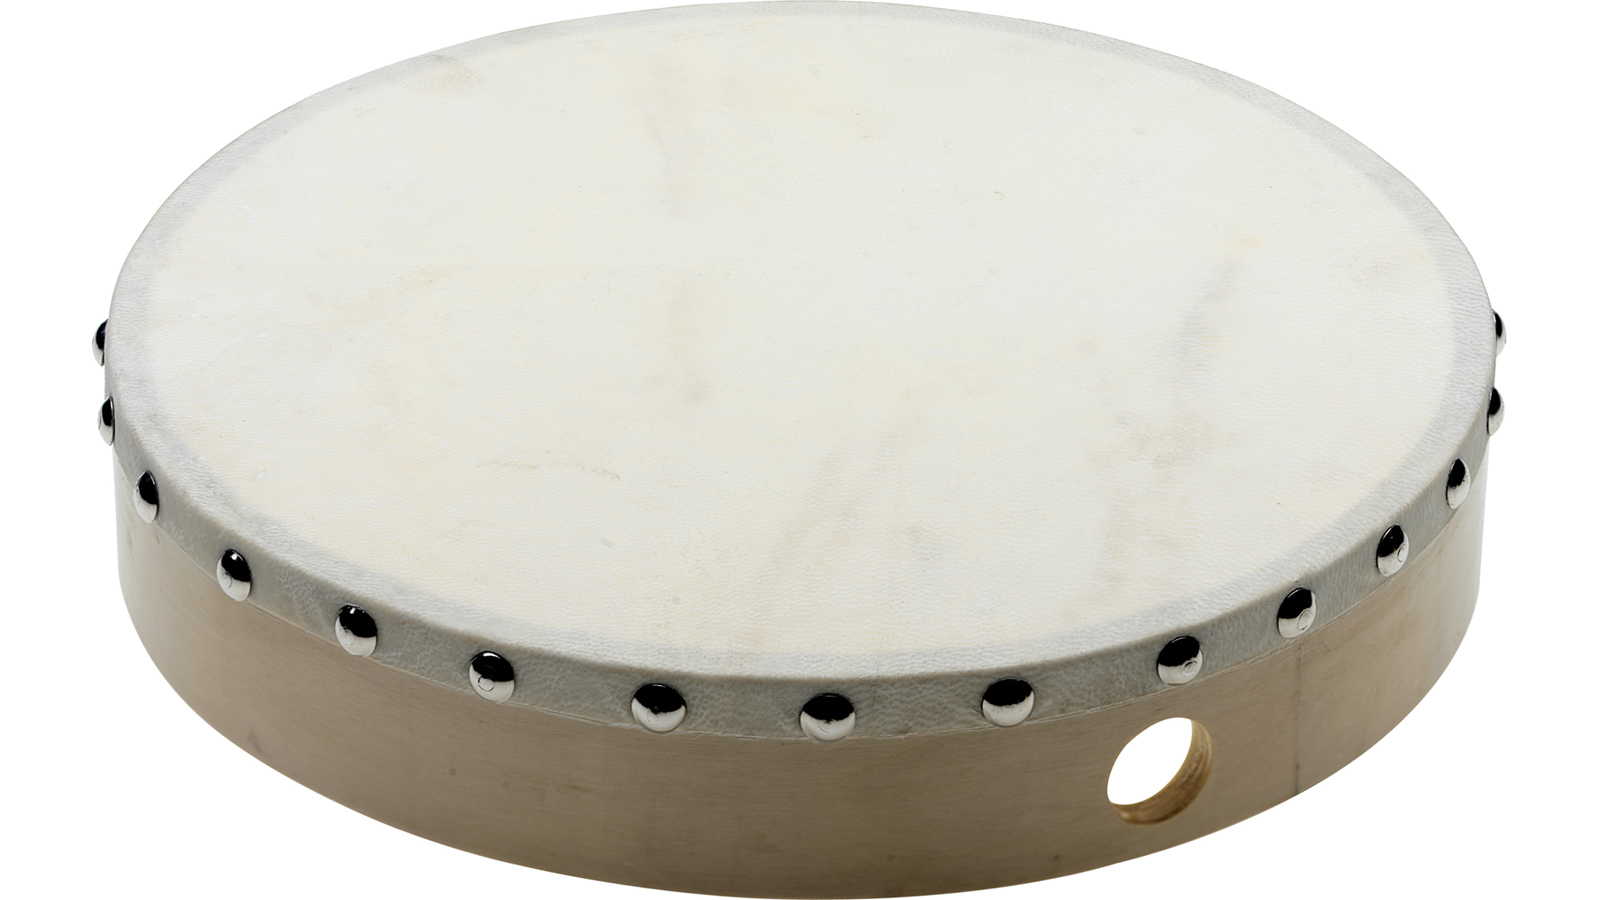 Stagg SHD-1010 10'' Handtrommel